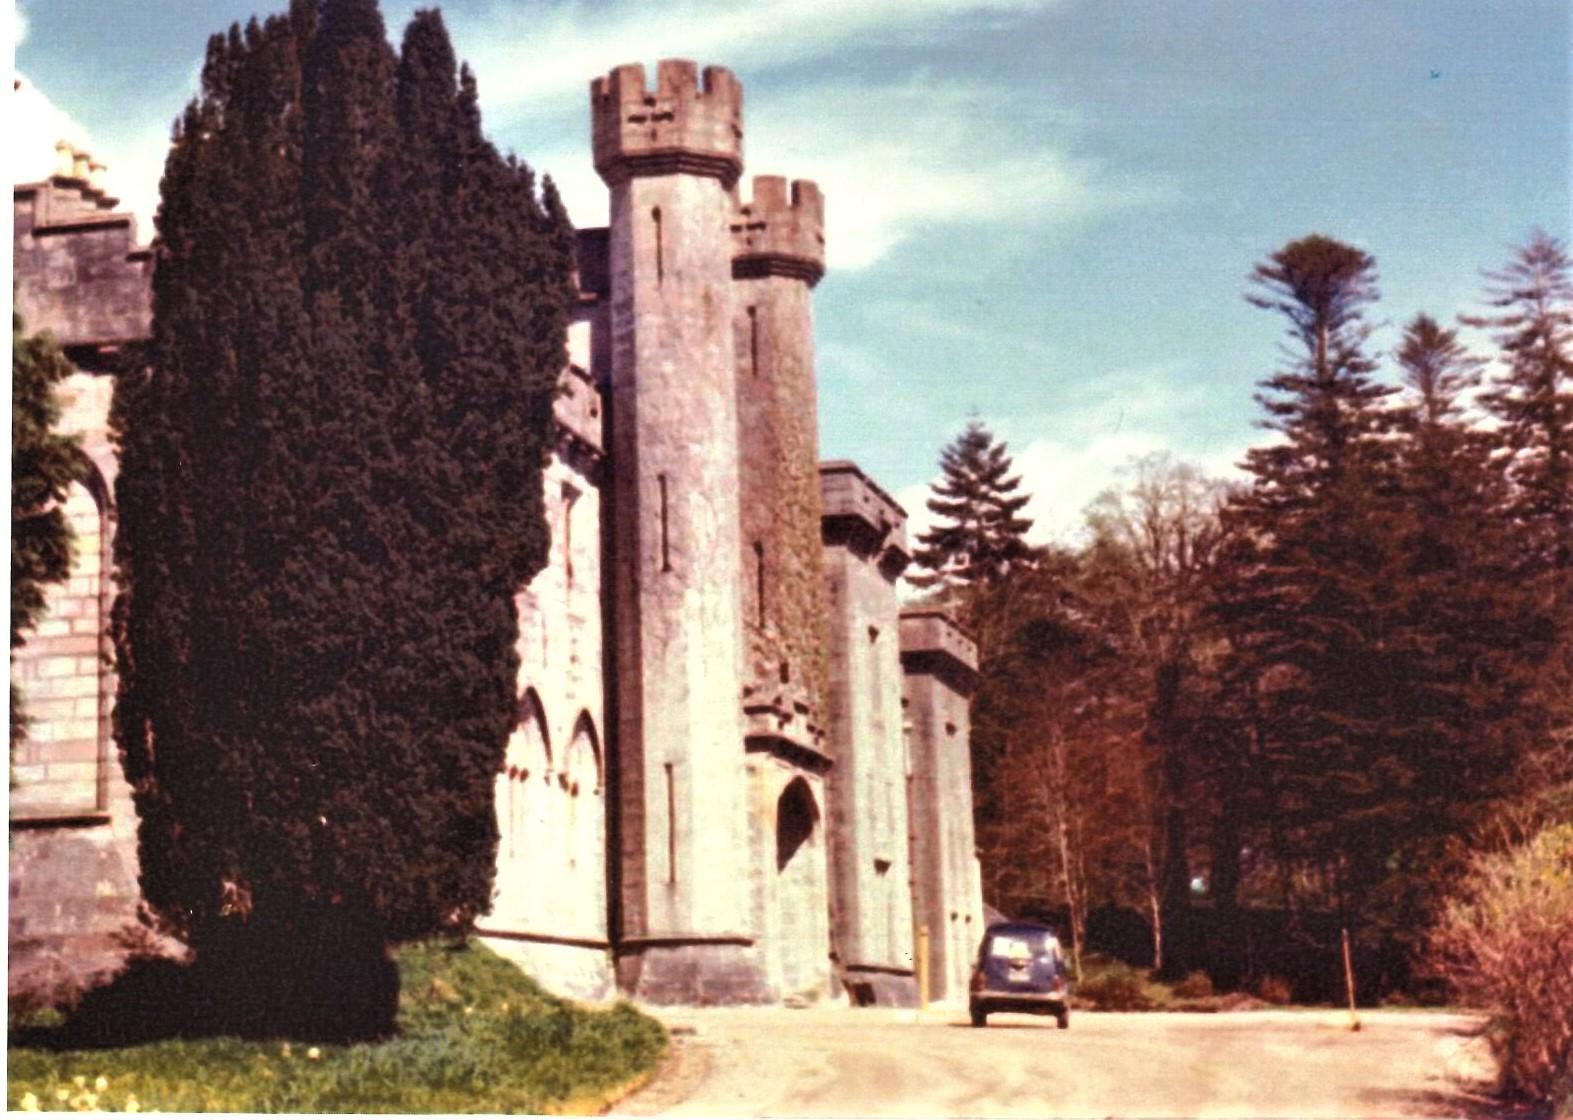 Armadale Castle was in a poor state of repair in 1971